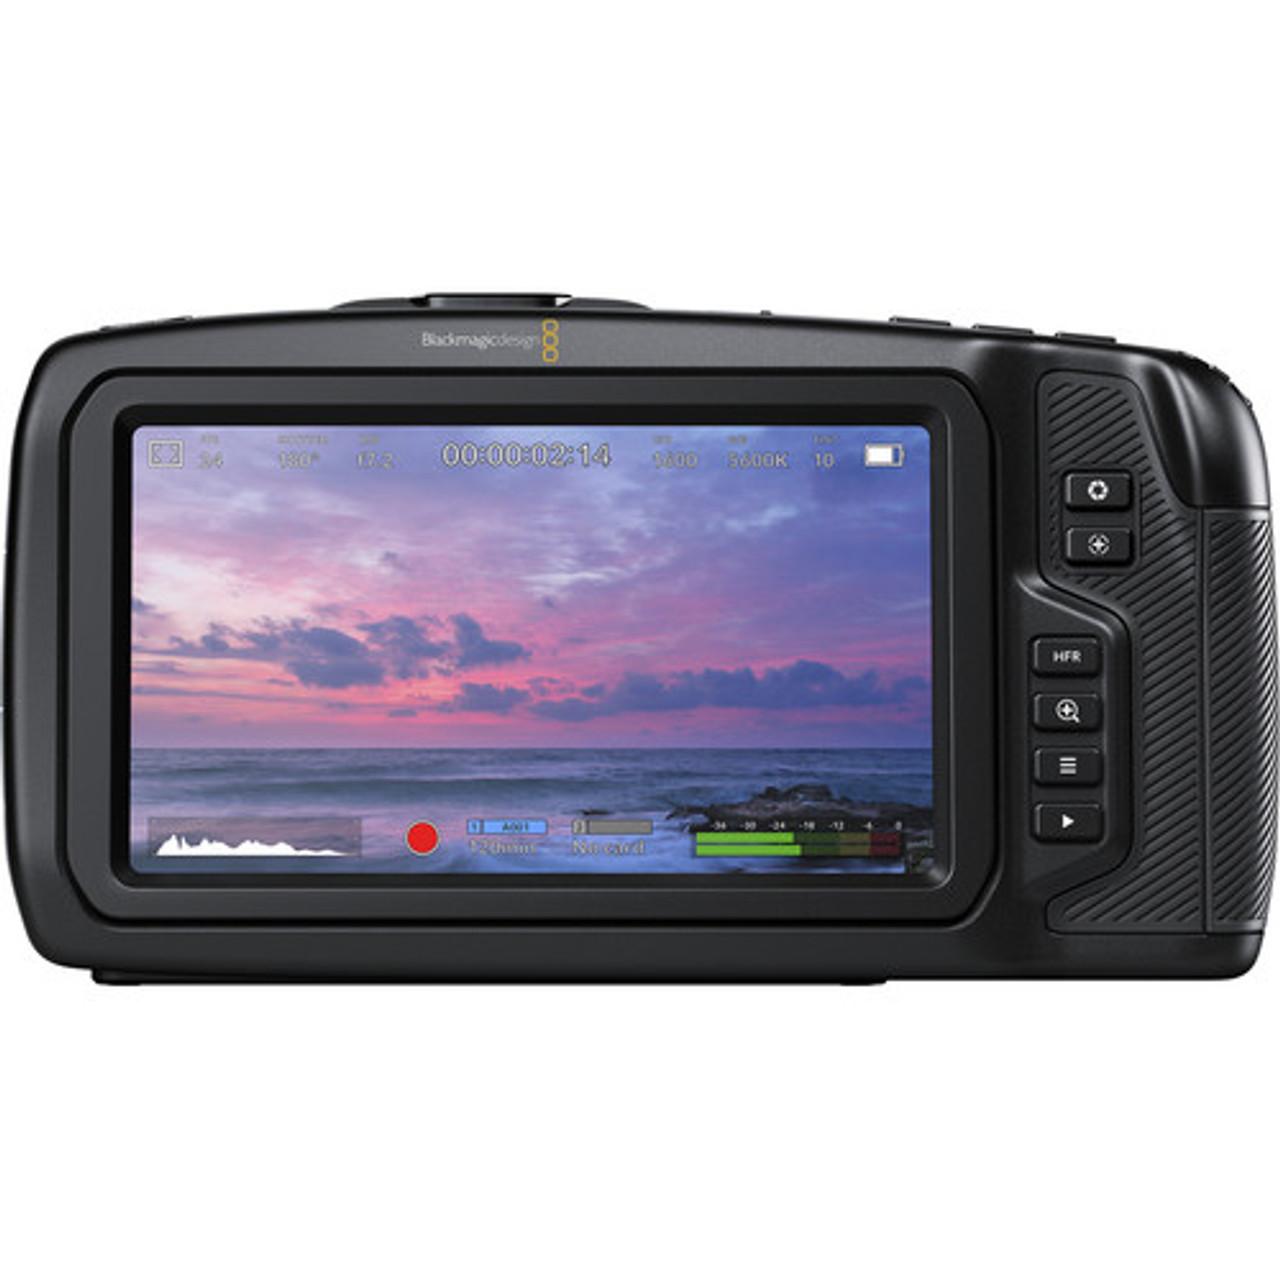 Blackmagic Design Pocket Cinema Camera 4k Body Only Auckland Nz